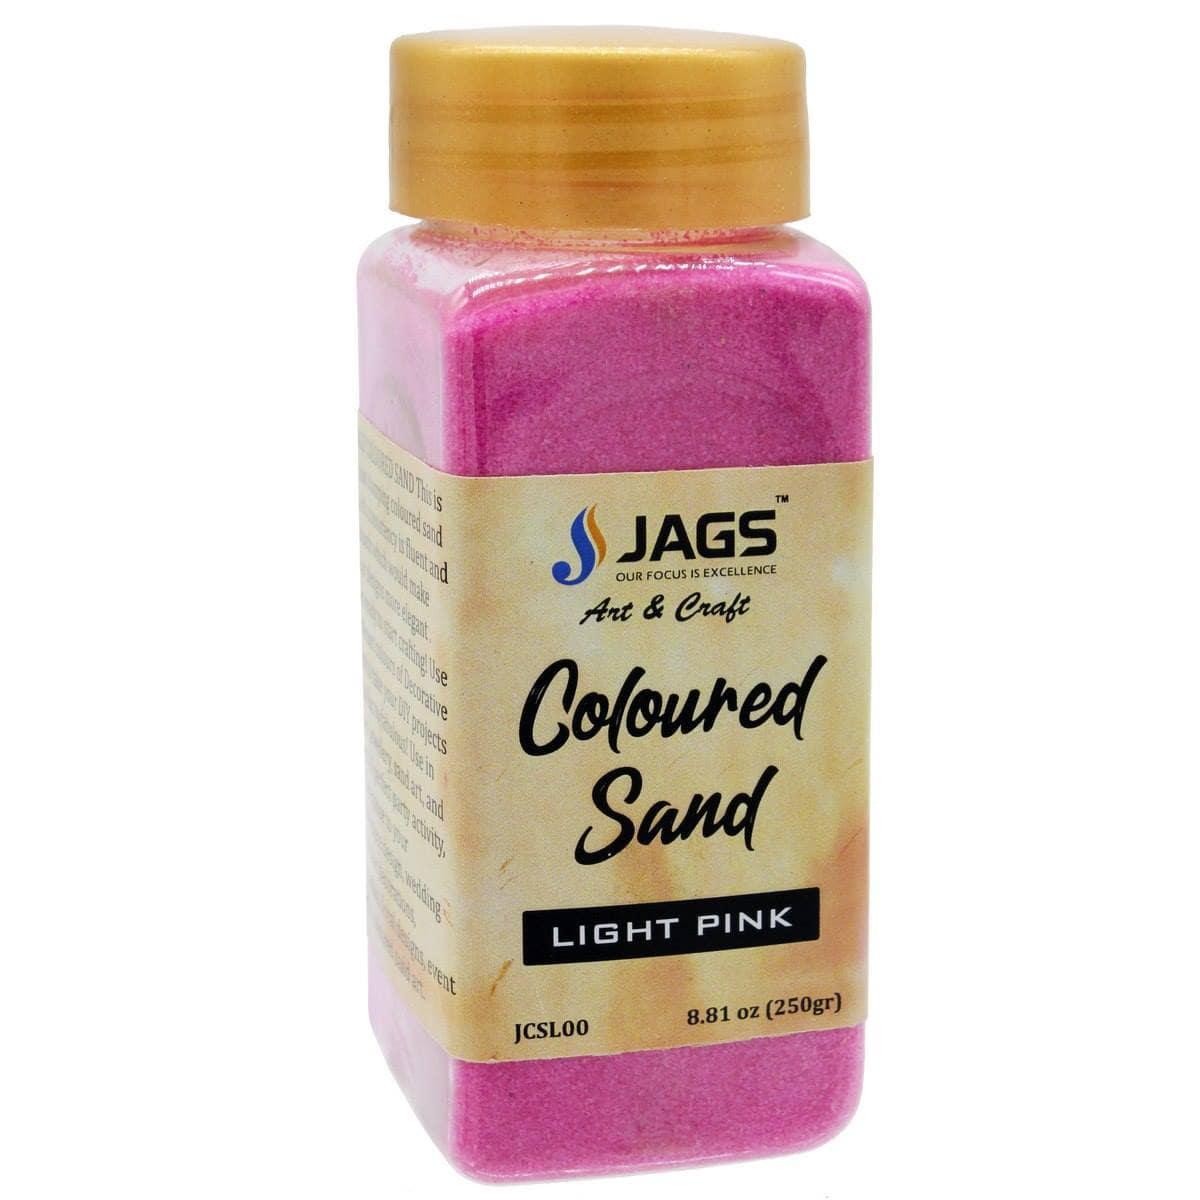 Coloured Sand Light Pink